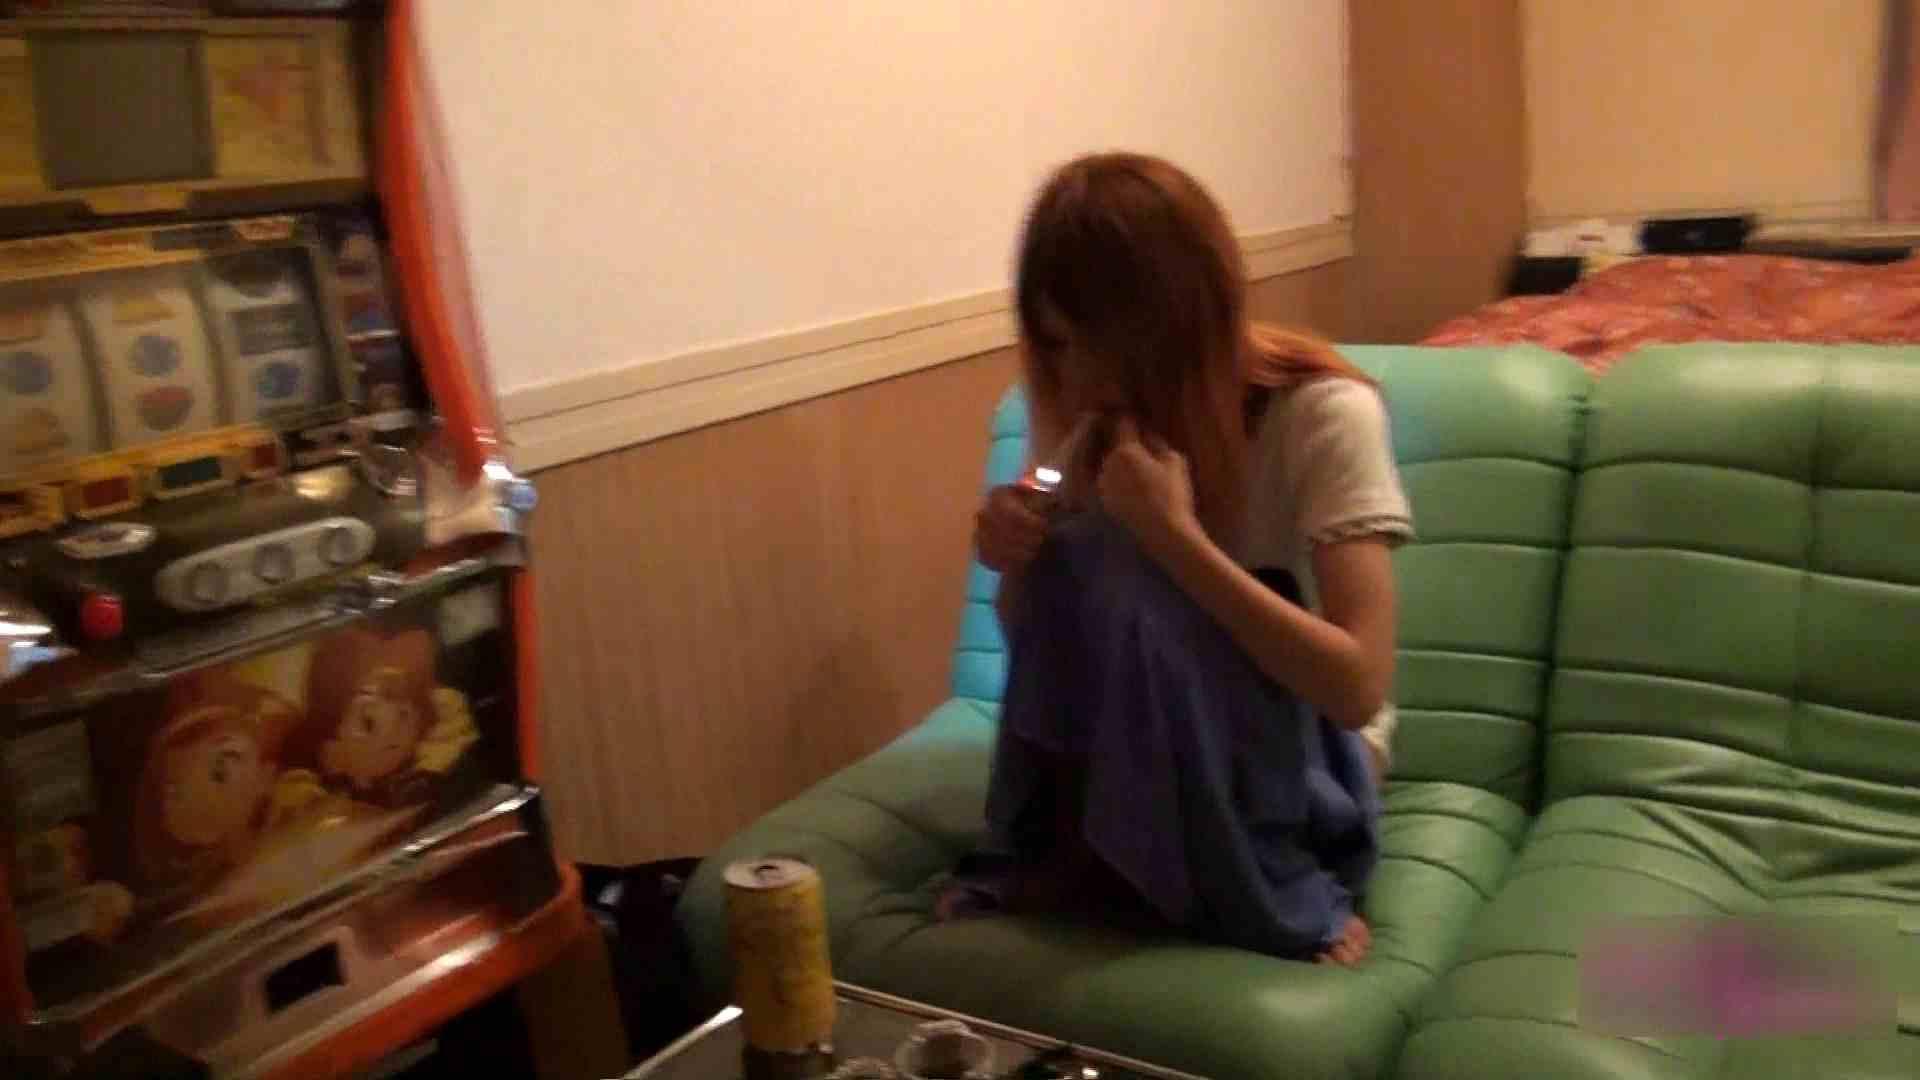 S級厳選美女ビッチガールVol.01 OLエロ画像  35PICs 12